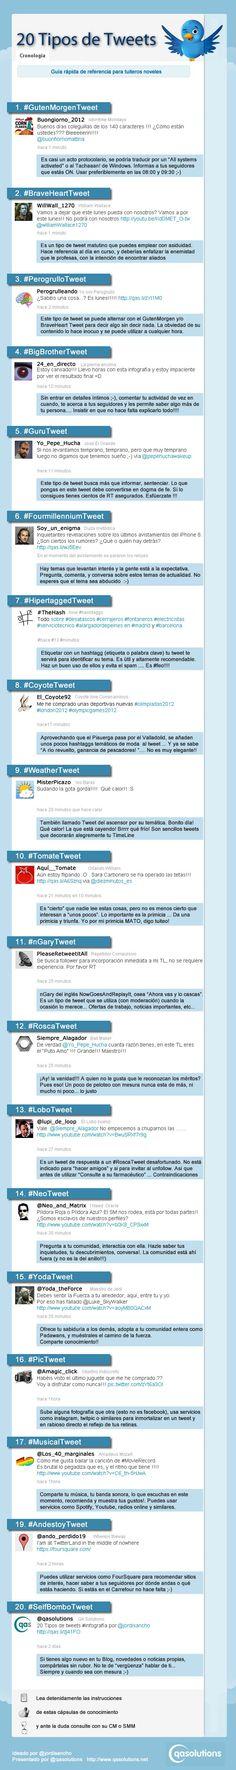 #Infografia 20 tipos de tweets #humor